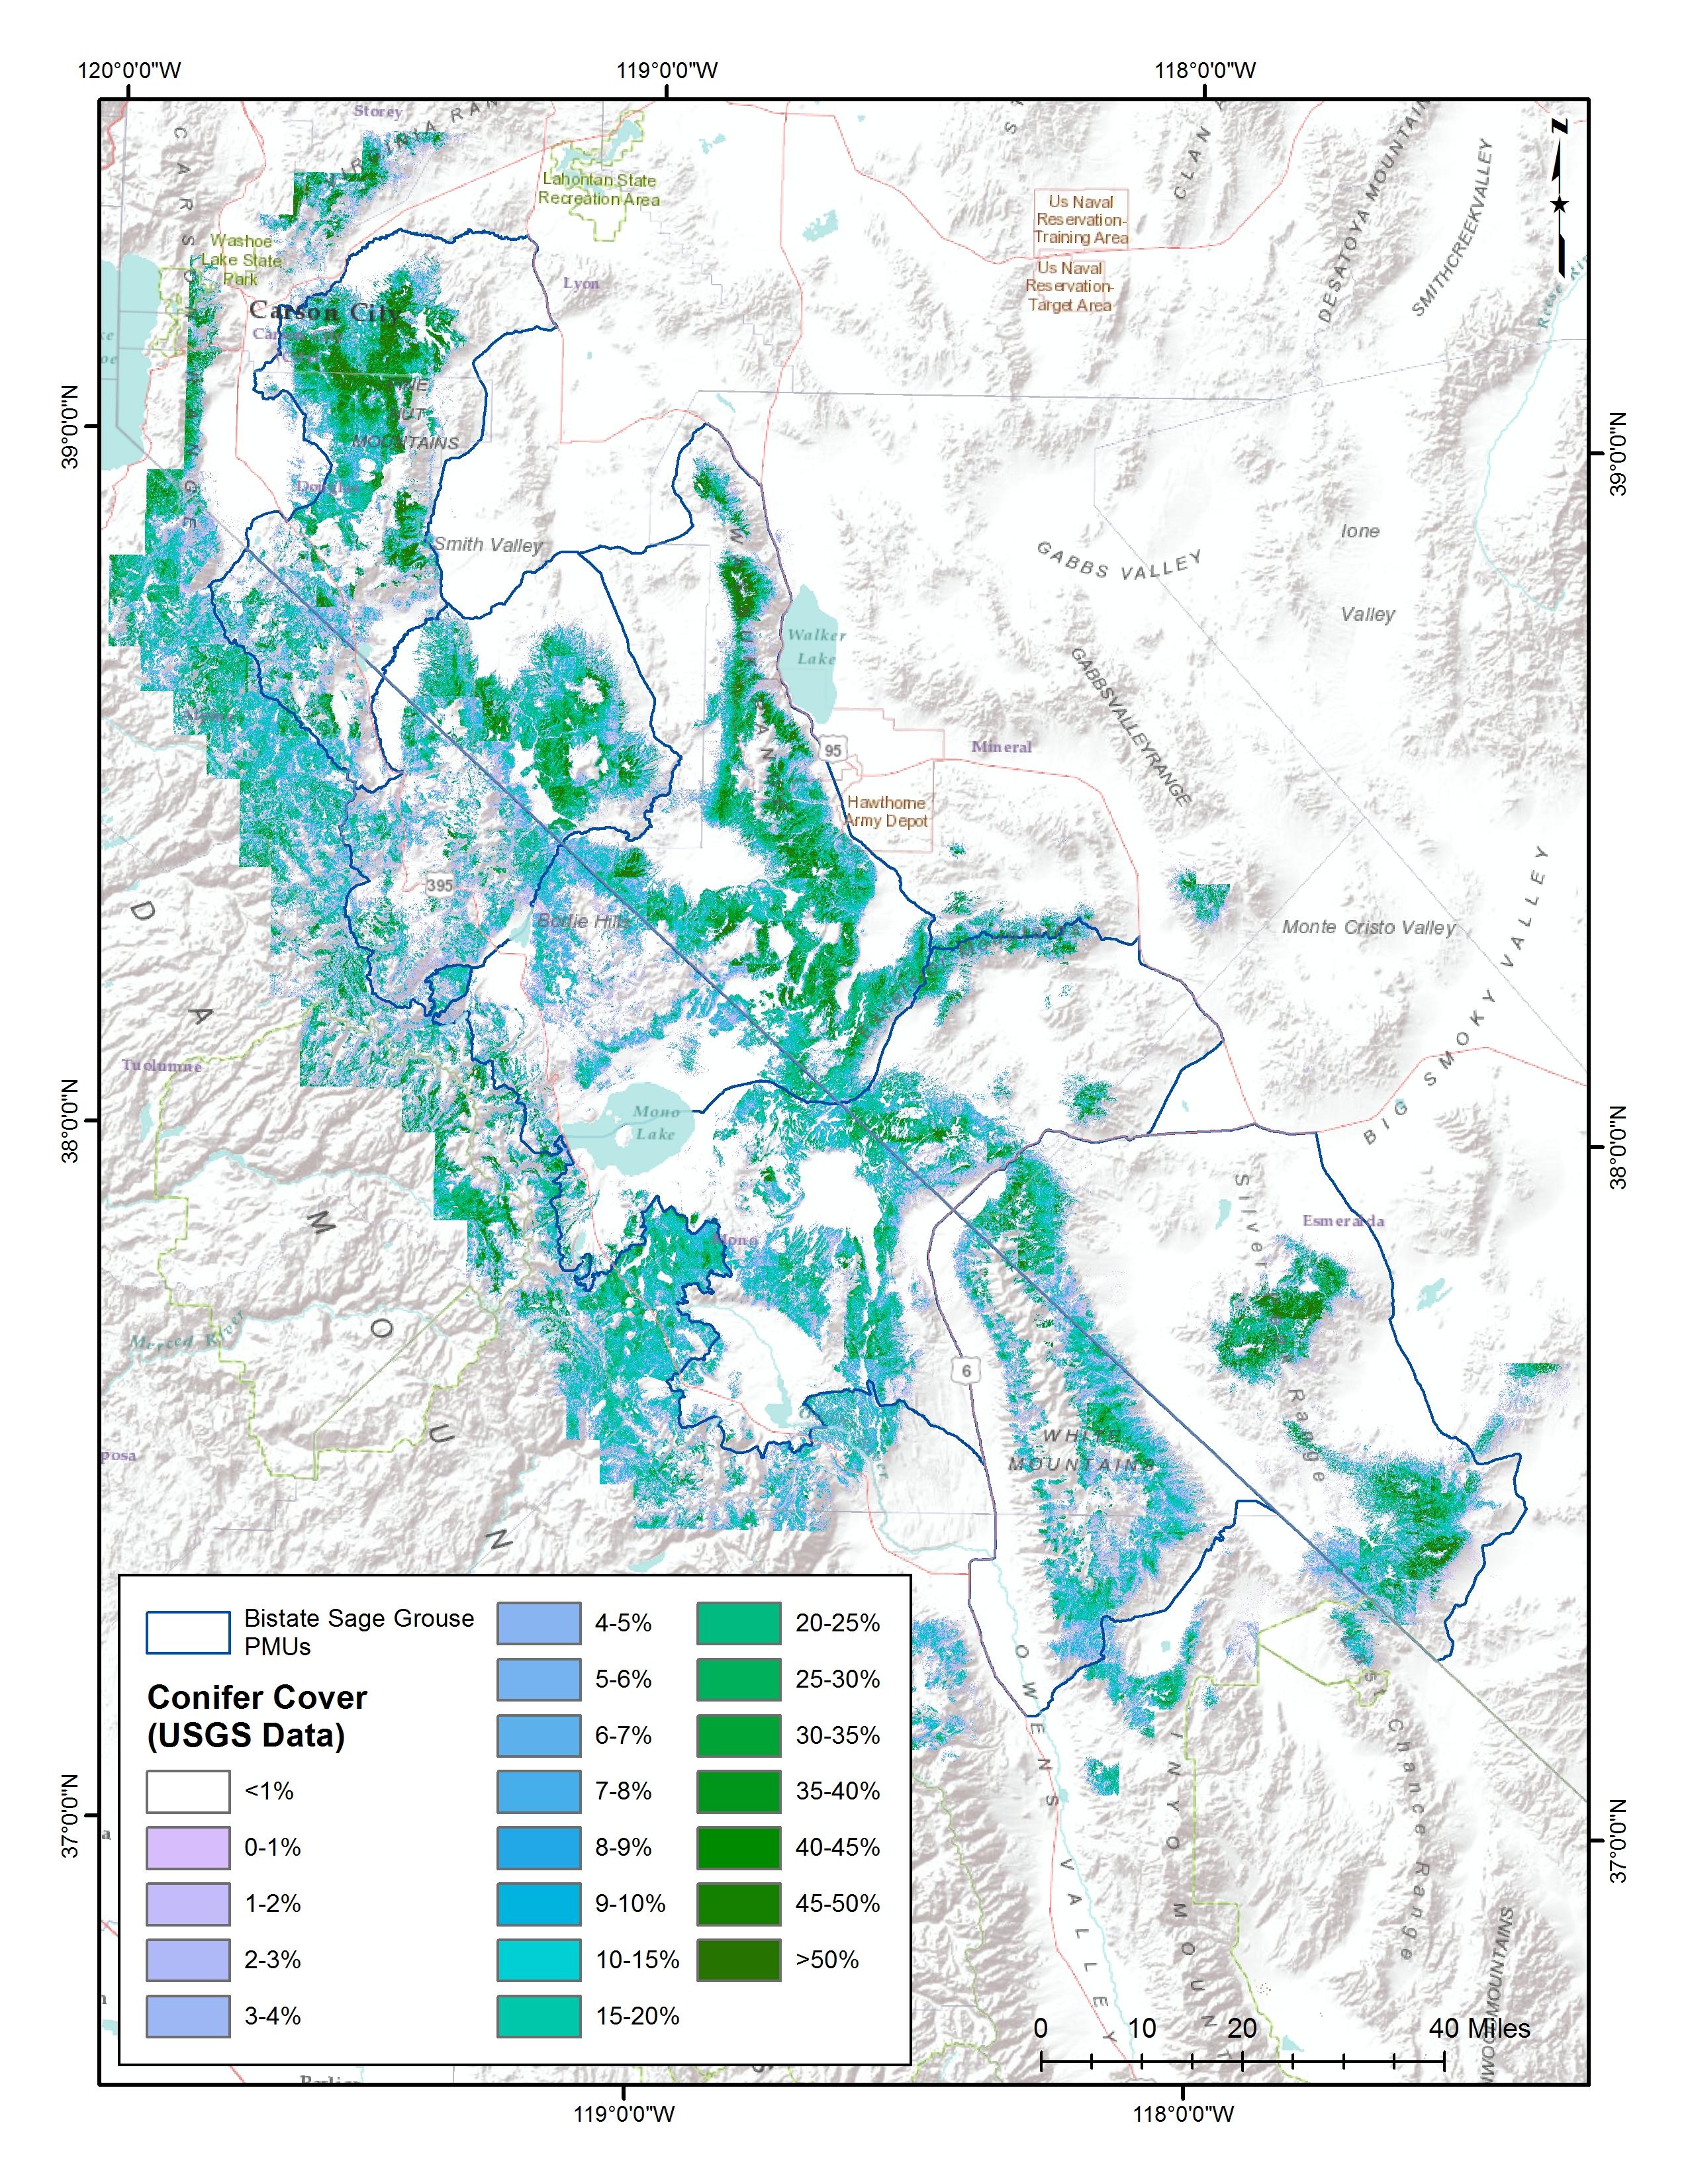 Conifer map